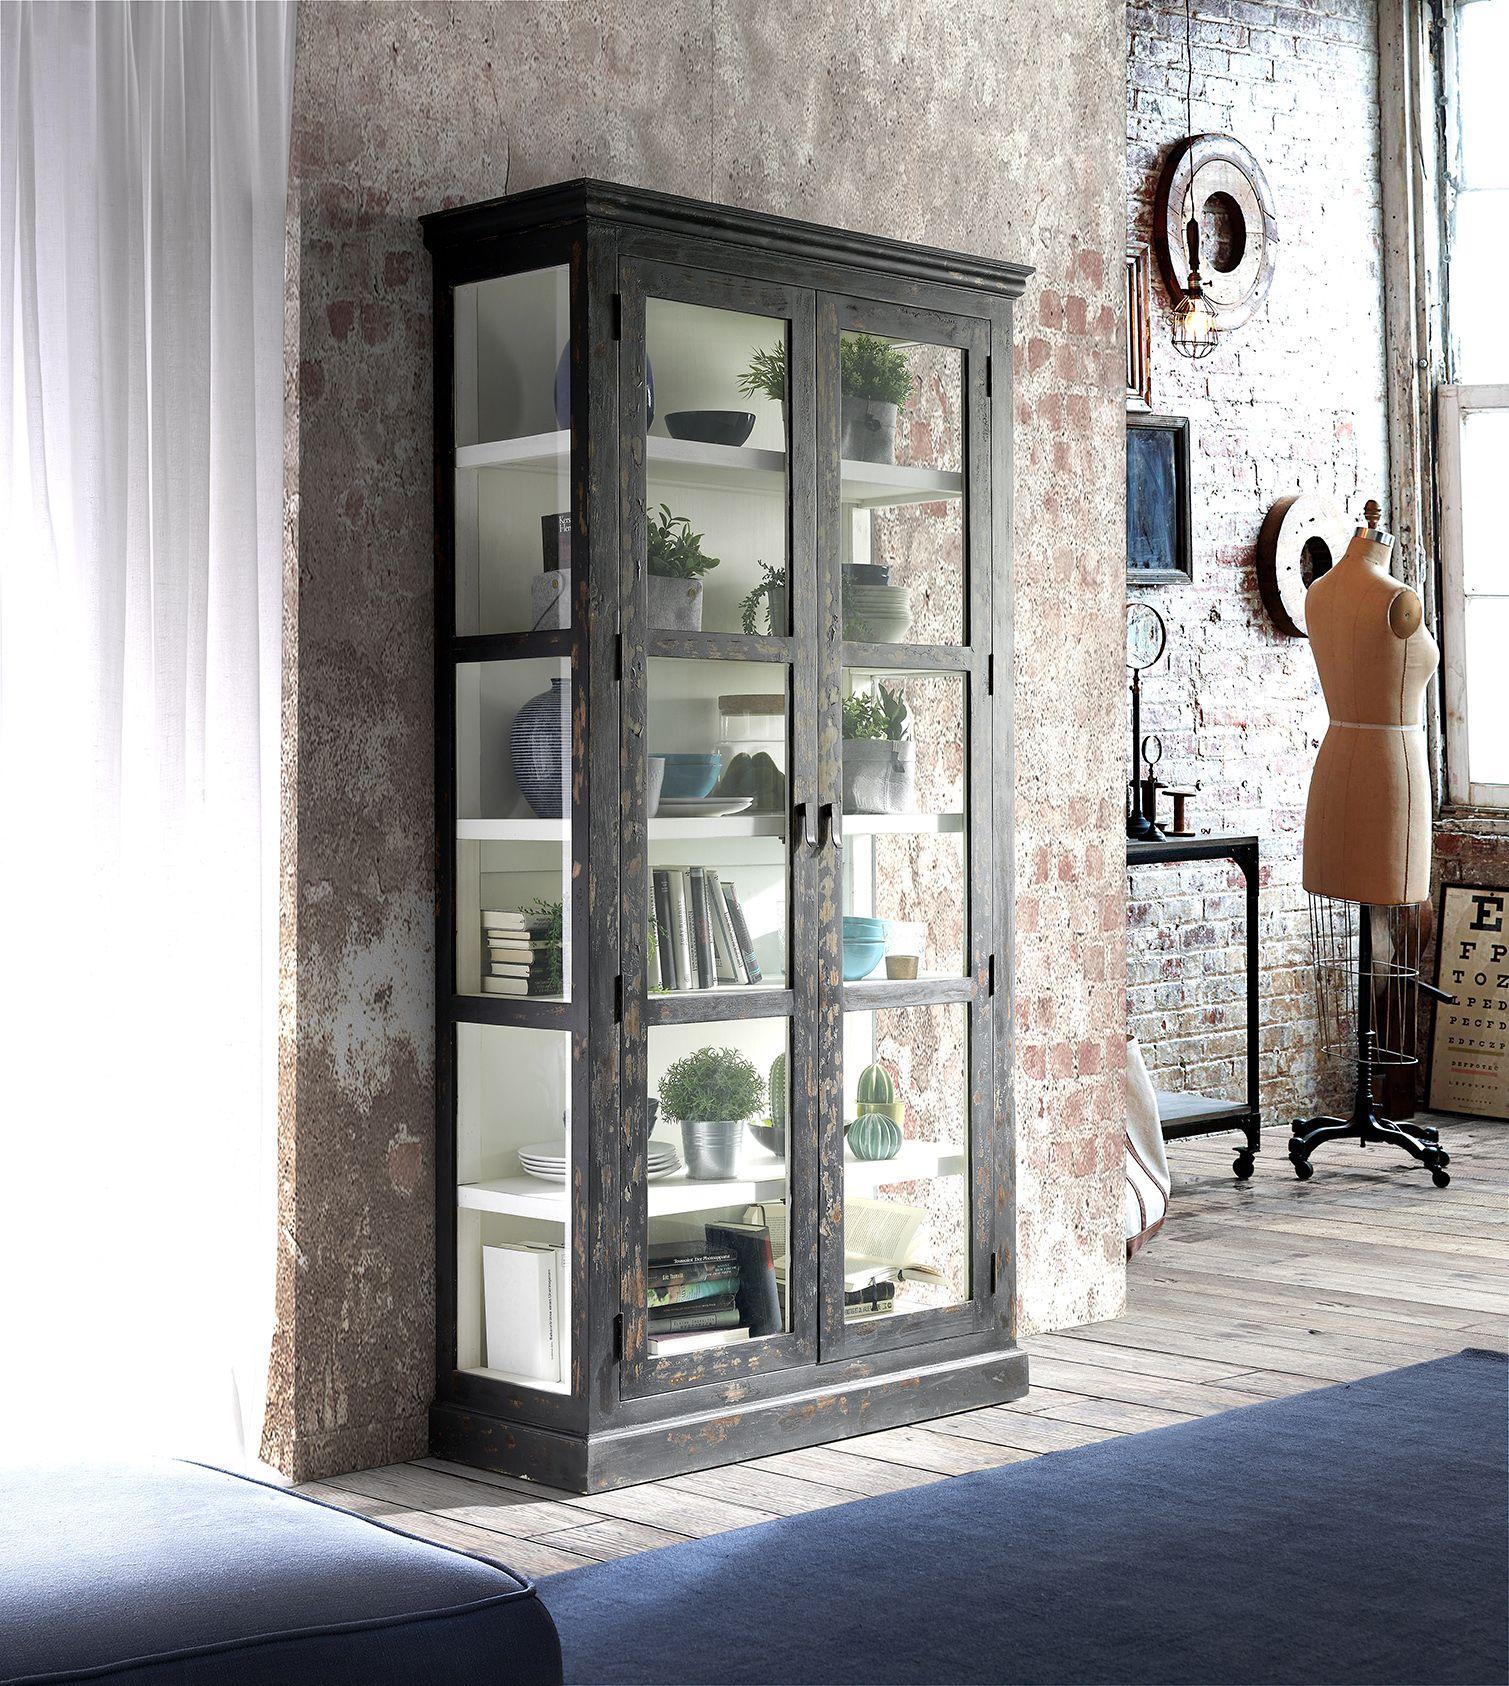 f6dd8f47487 Munduk | Vitrina Glass. Vintage, moderno, industrial...combínala con  cualquier estilo. Te sorprenderá. #mundukhome #madera #vintage #vitrina  #salón ...